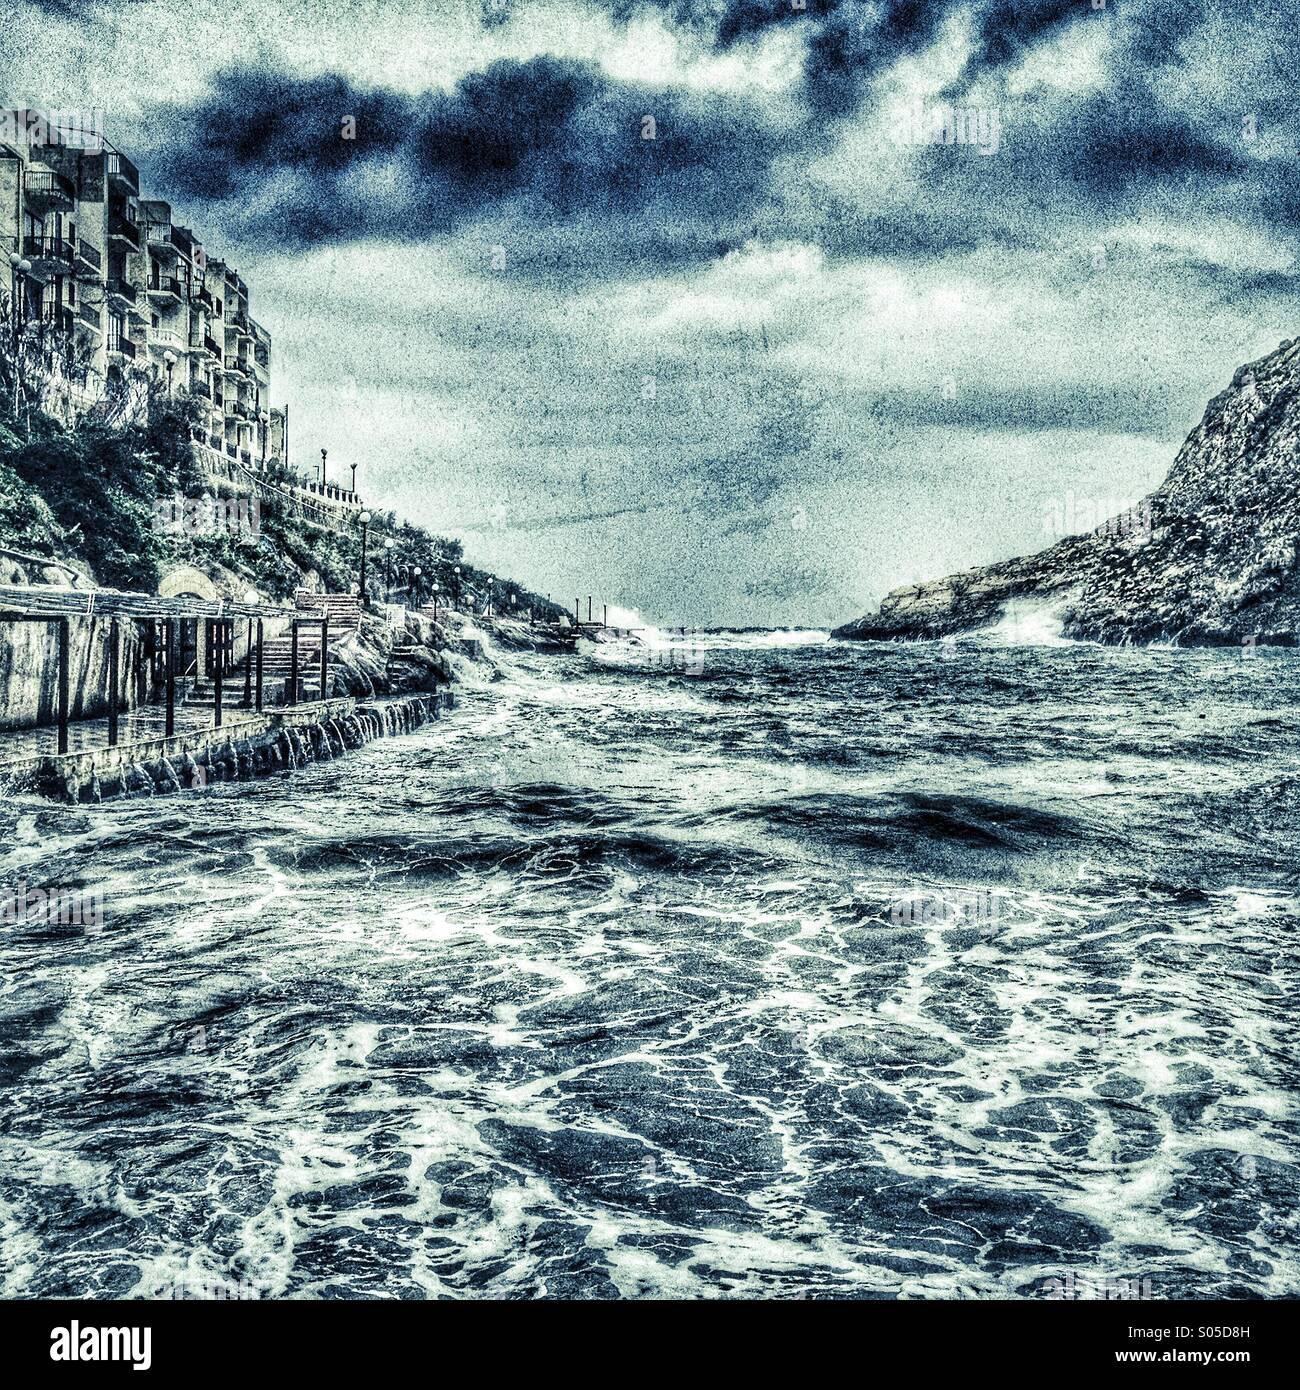 Storm seas lashing into small harbour - Stock Image